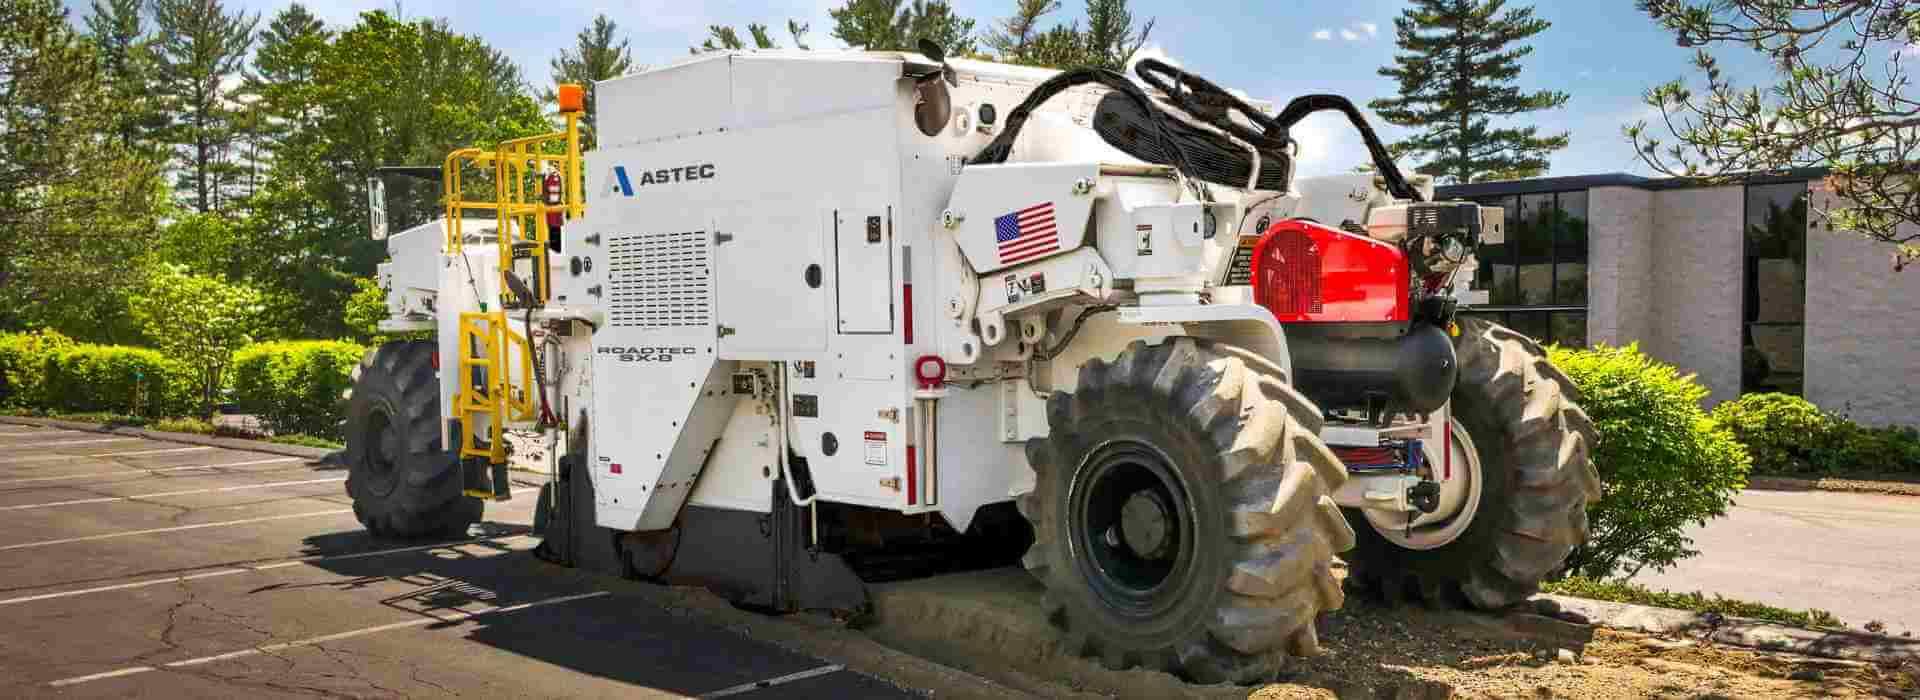 Roadtec SX-8 Soil Stabilizer/Reclaimer reclaiming an asphalt surface